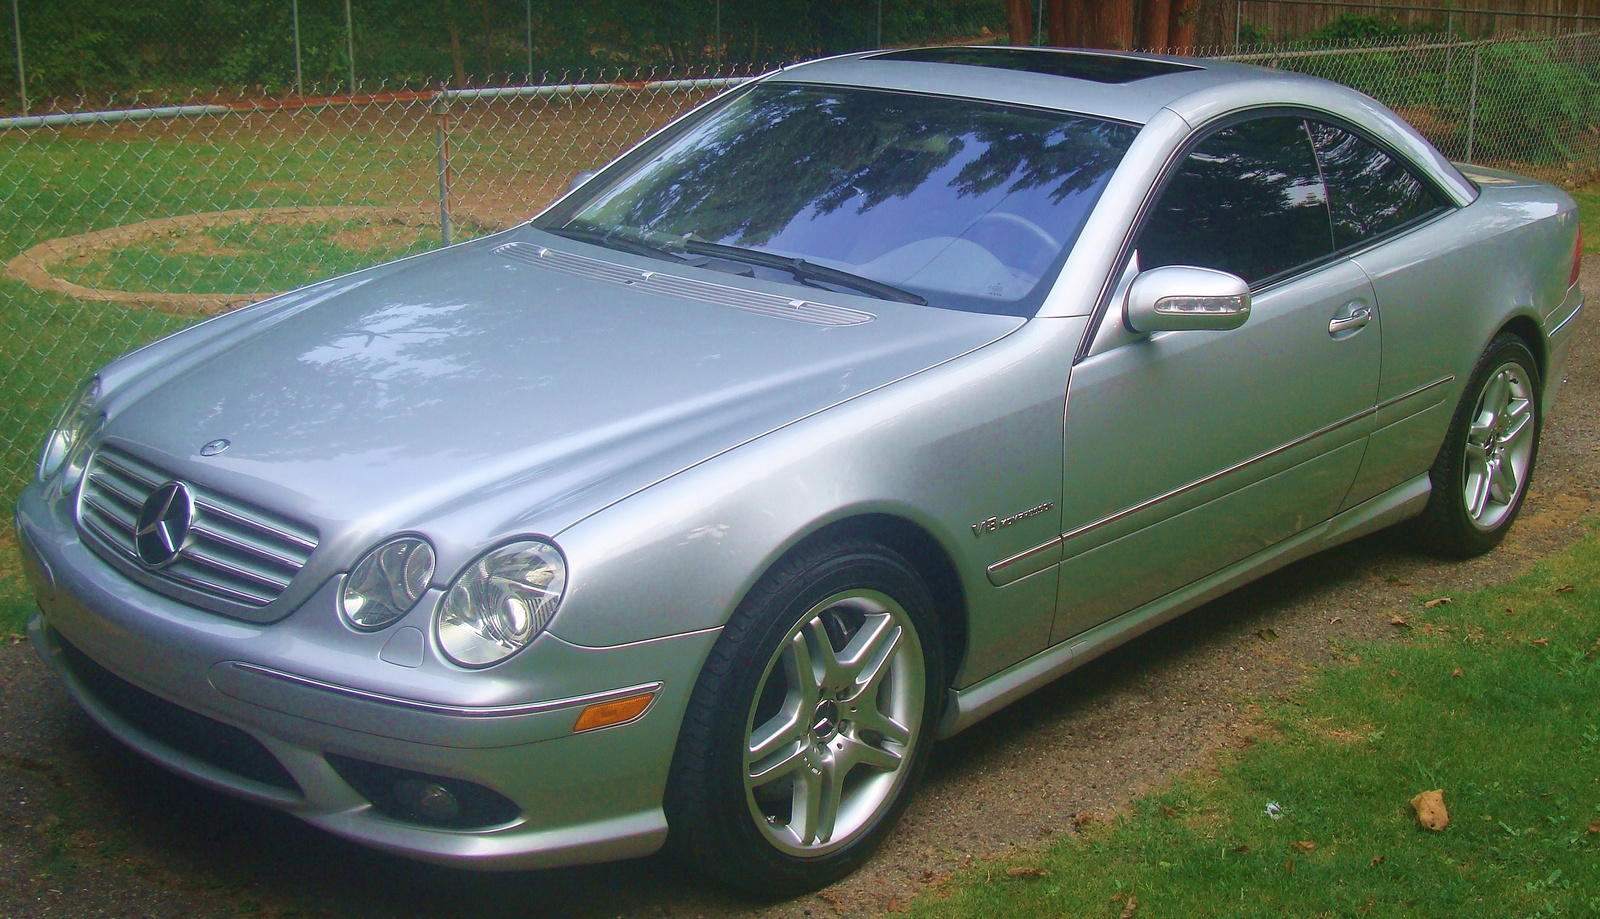 2005 Mercedes Benz Cl Class Exterior Pictures Cargurus